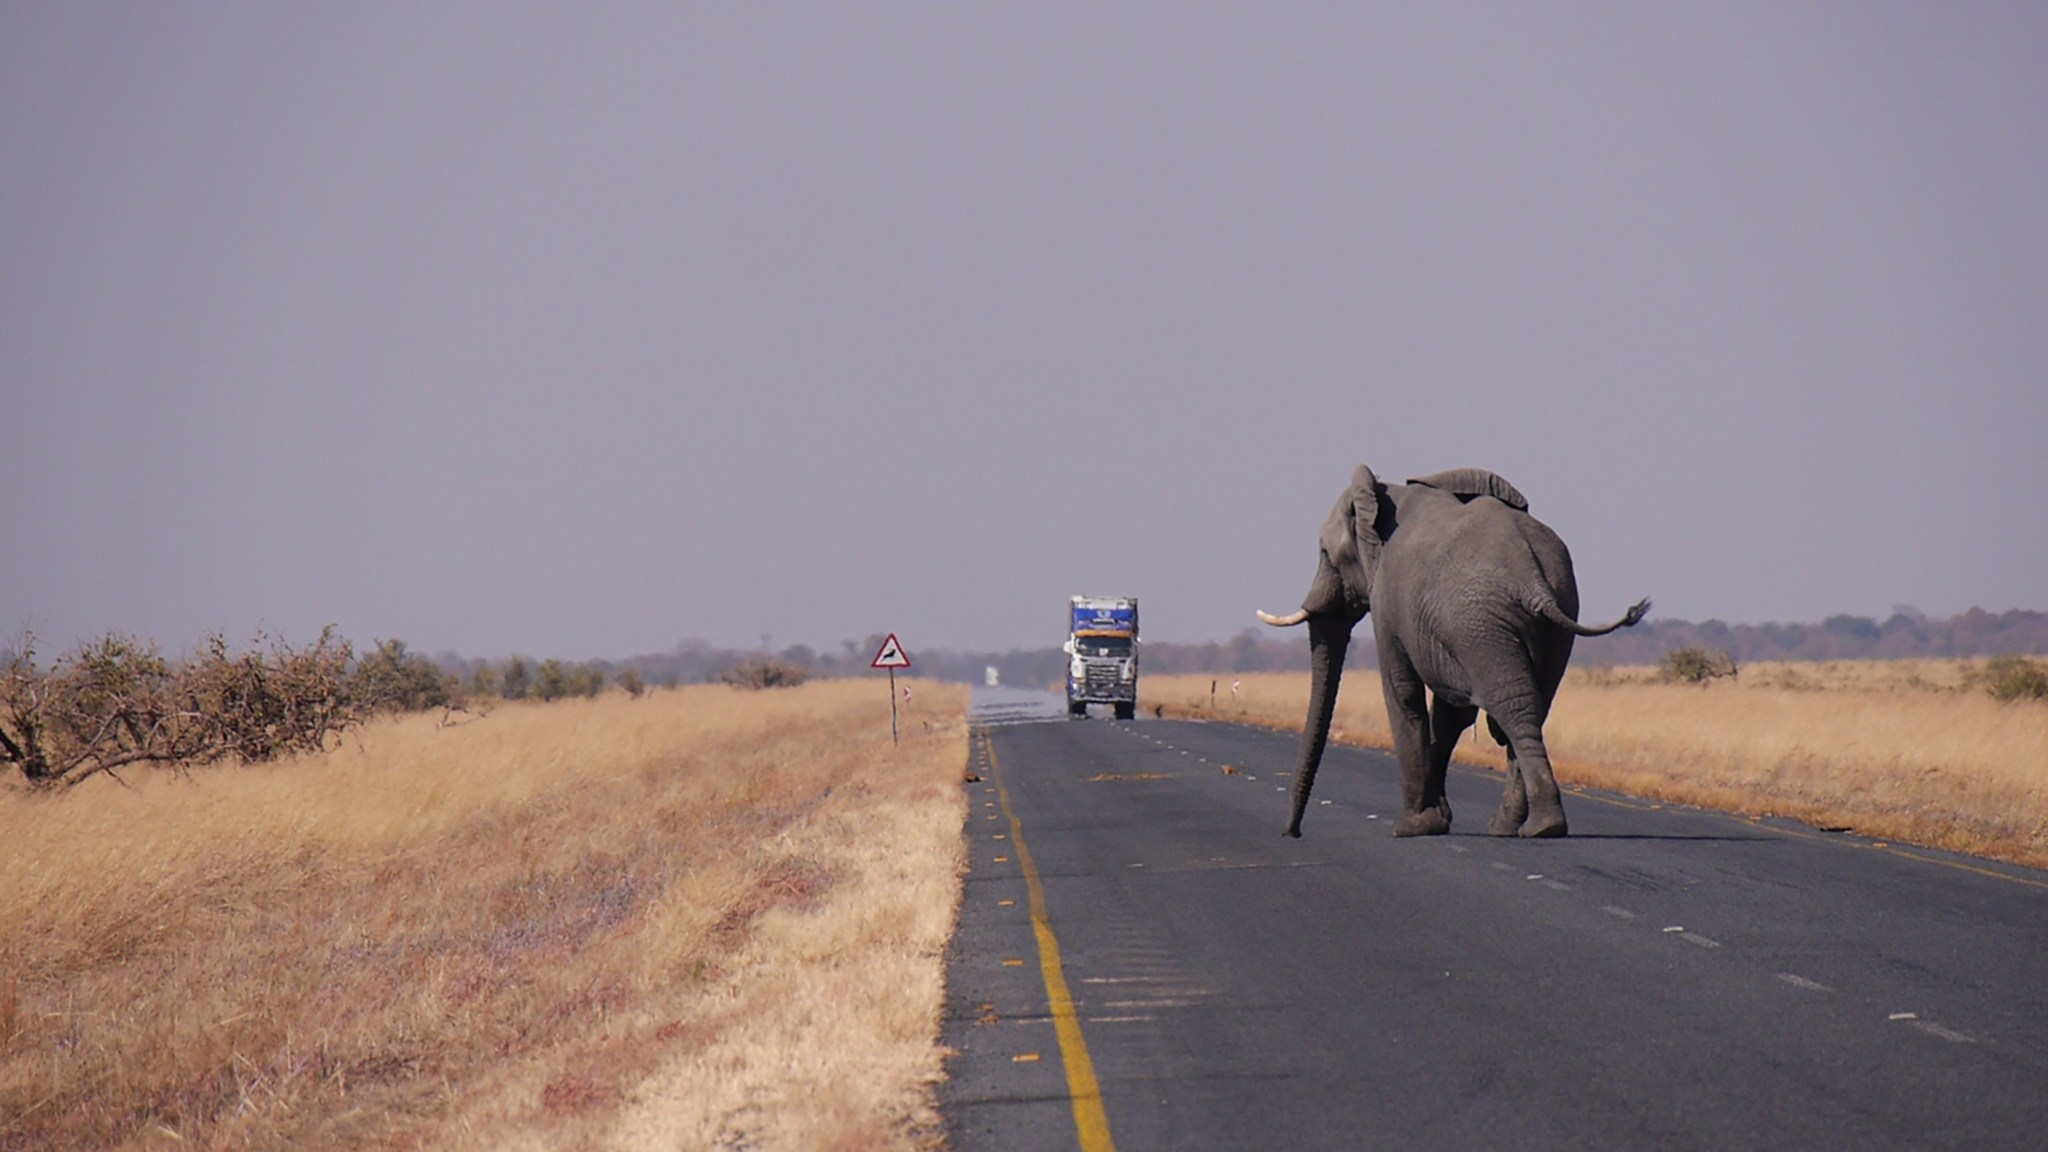 Botswana Ein Elefant kostet 35'000 Euro